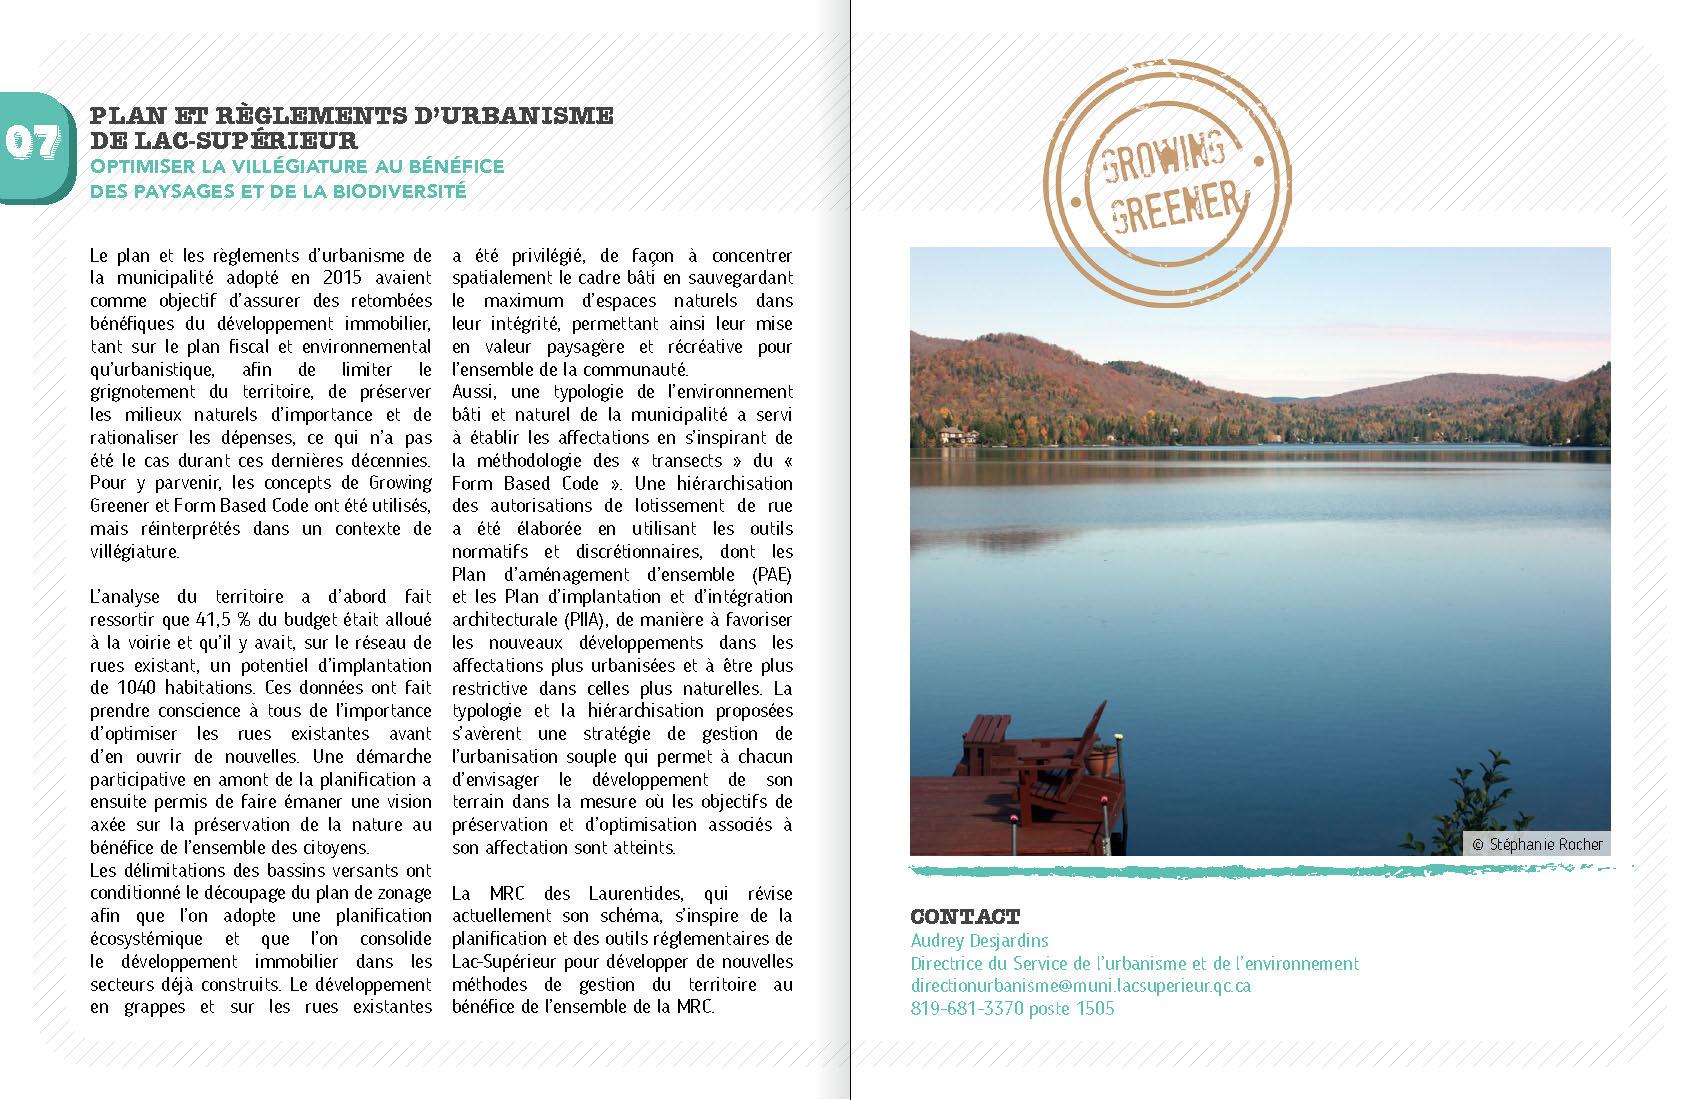 pr15-12_RRU_passeport_FINALv2_Page_10.jpg